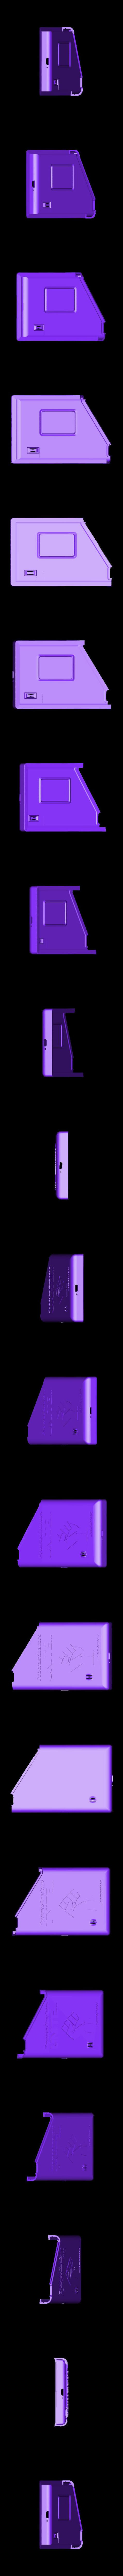 cova114_unten.stl Download free STL file Fairphone 2 cover • 3D printer model, unwohlpol